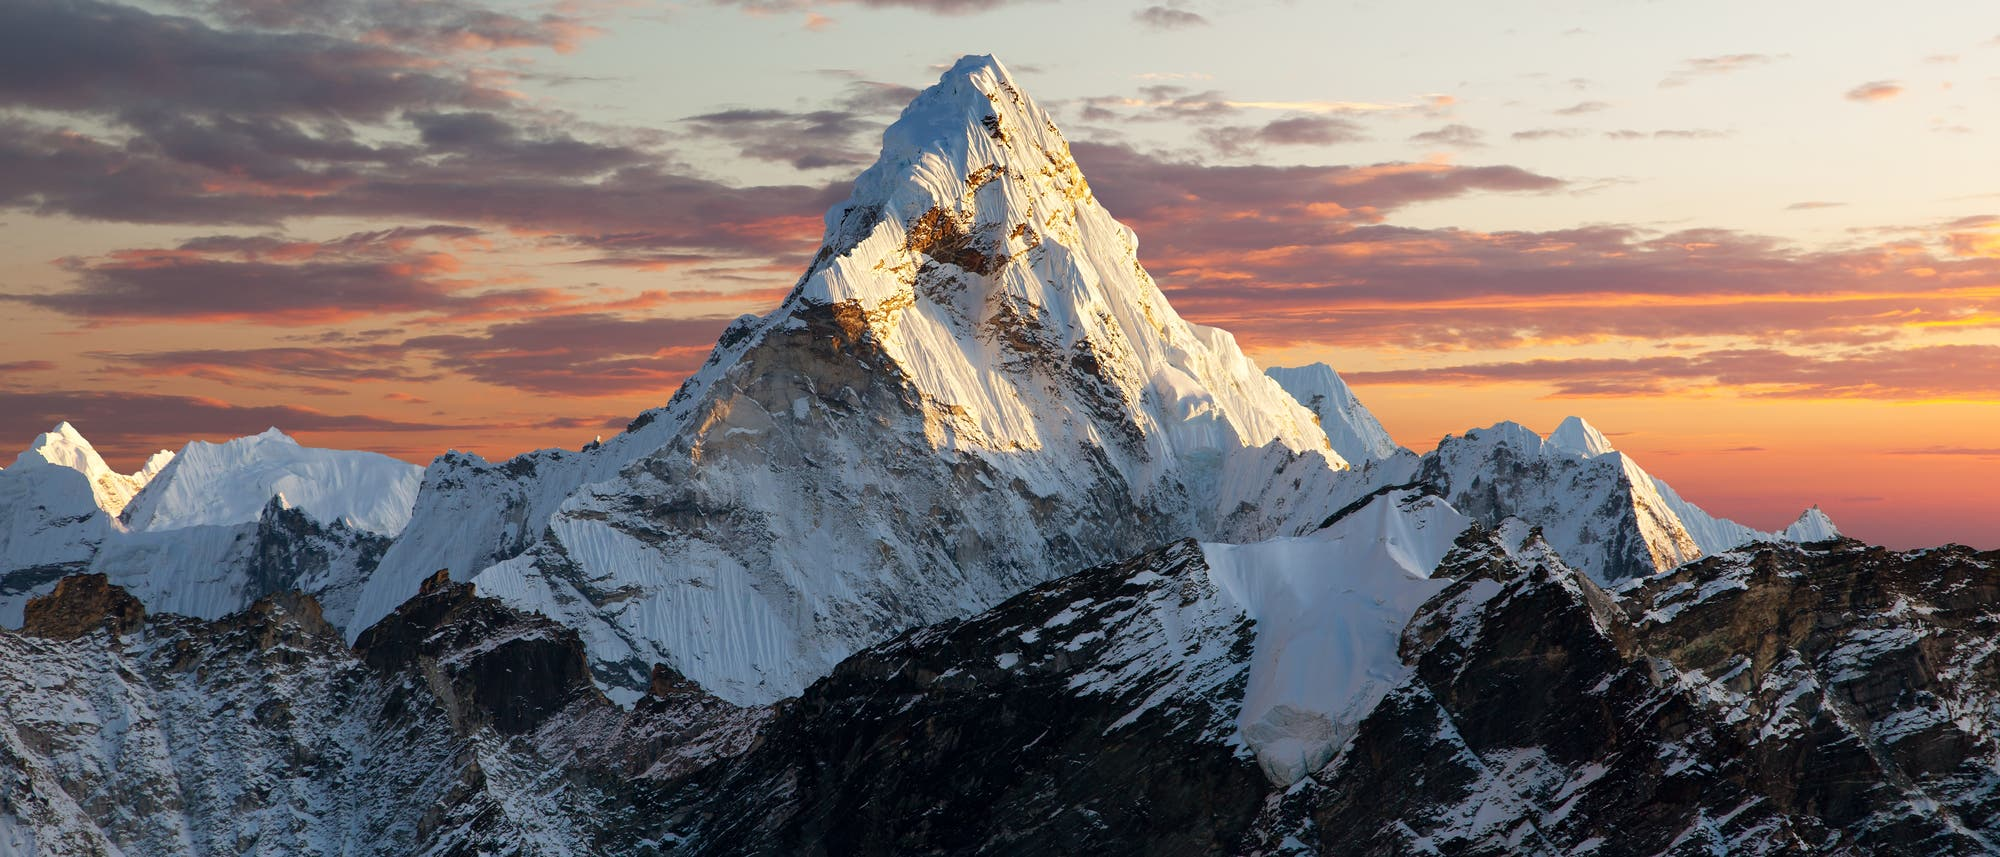 Abendblick auf den Mount Everest im Himalaja